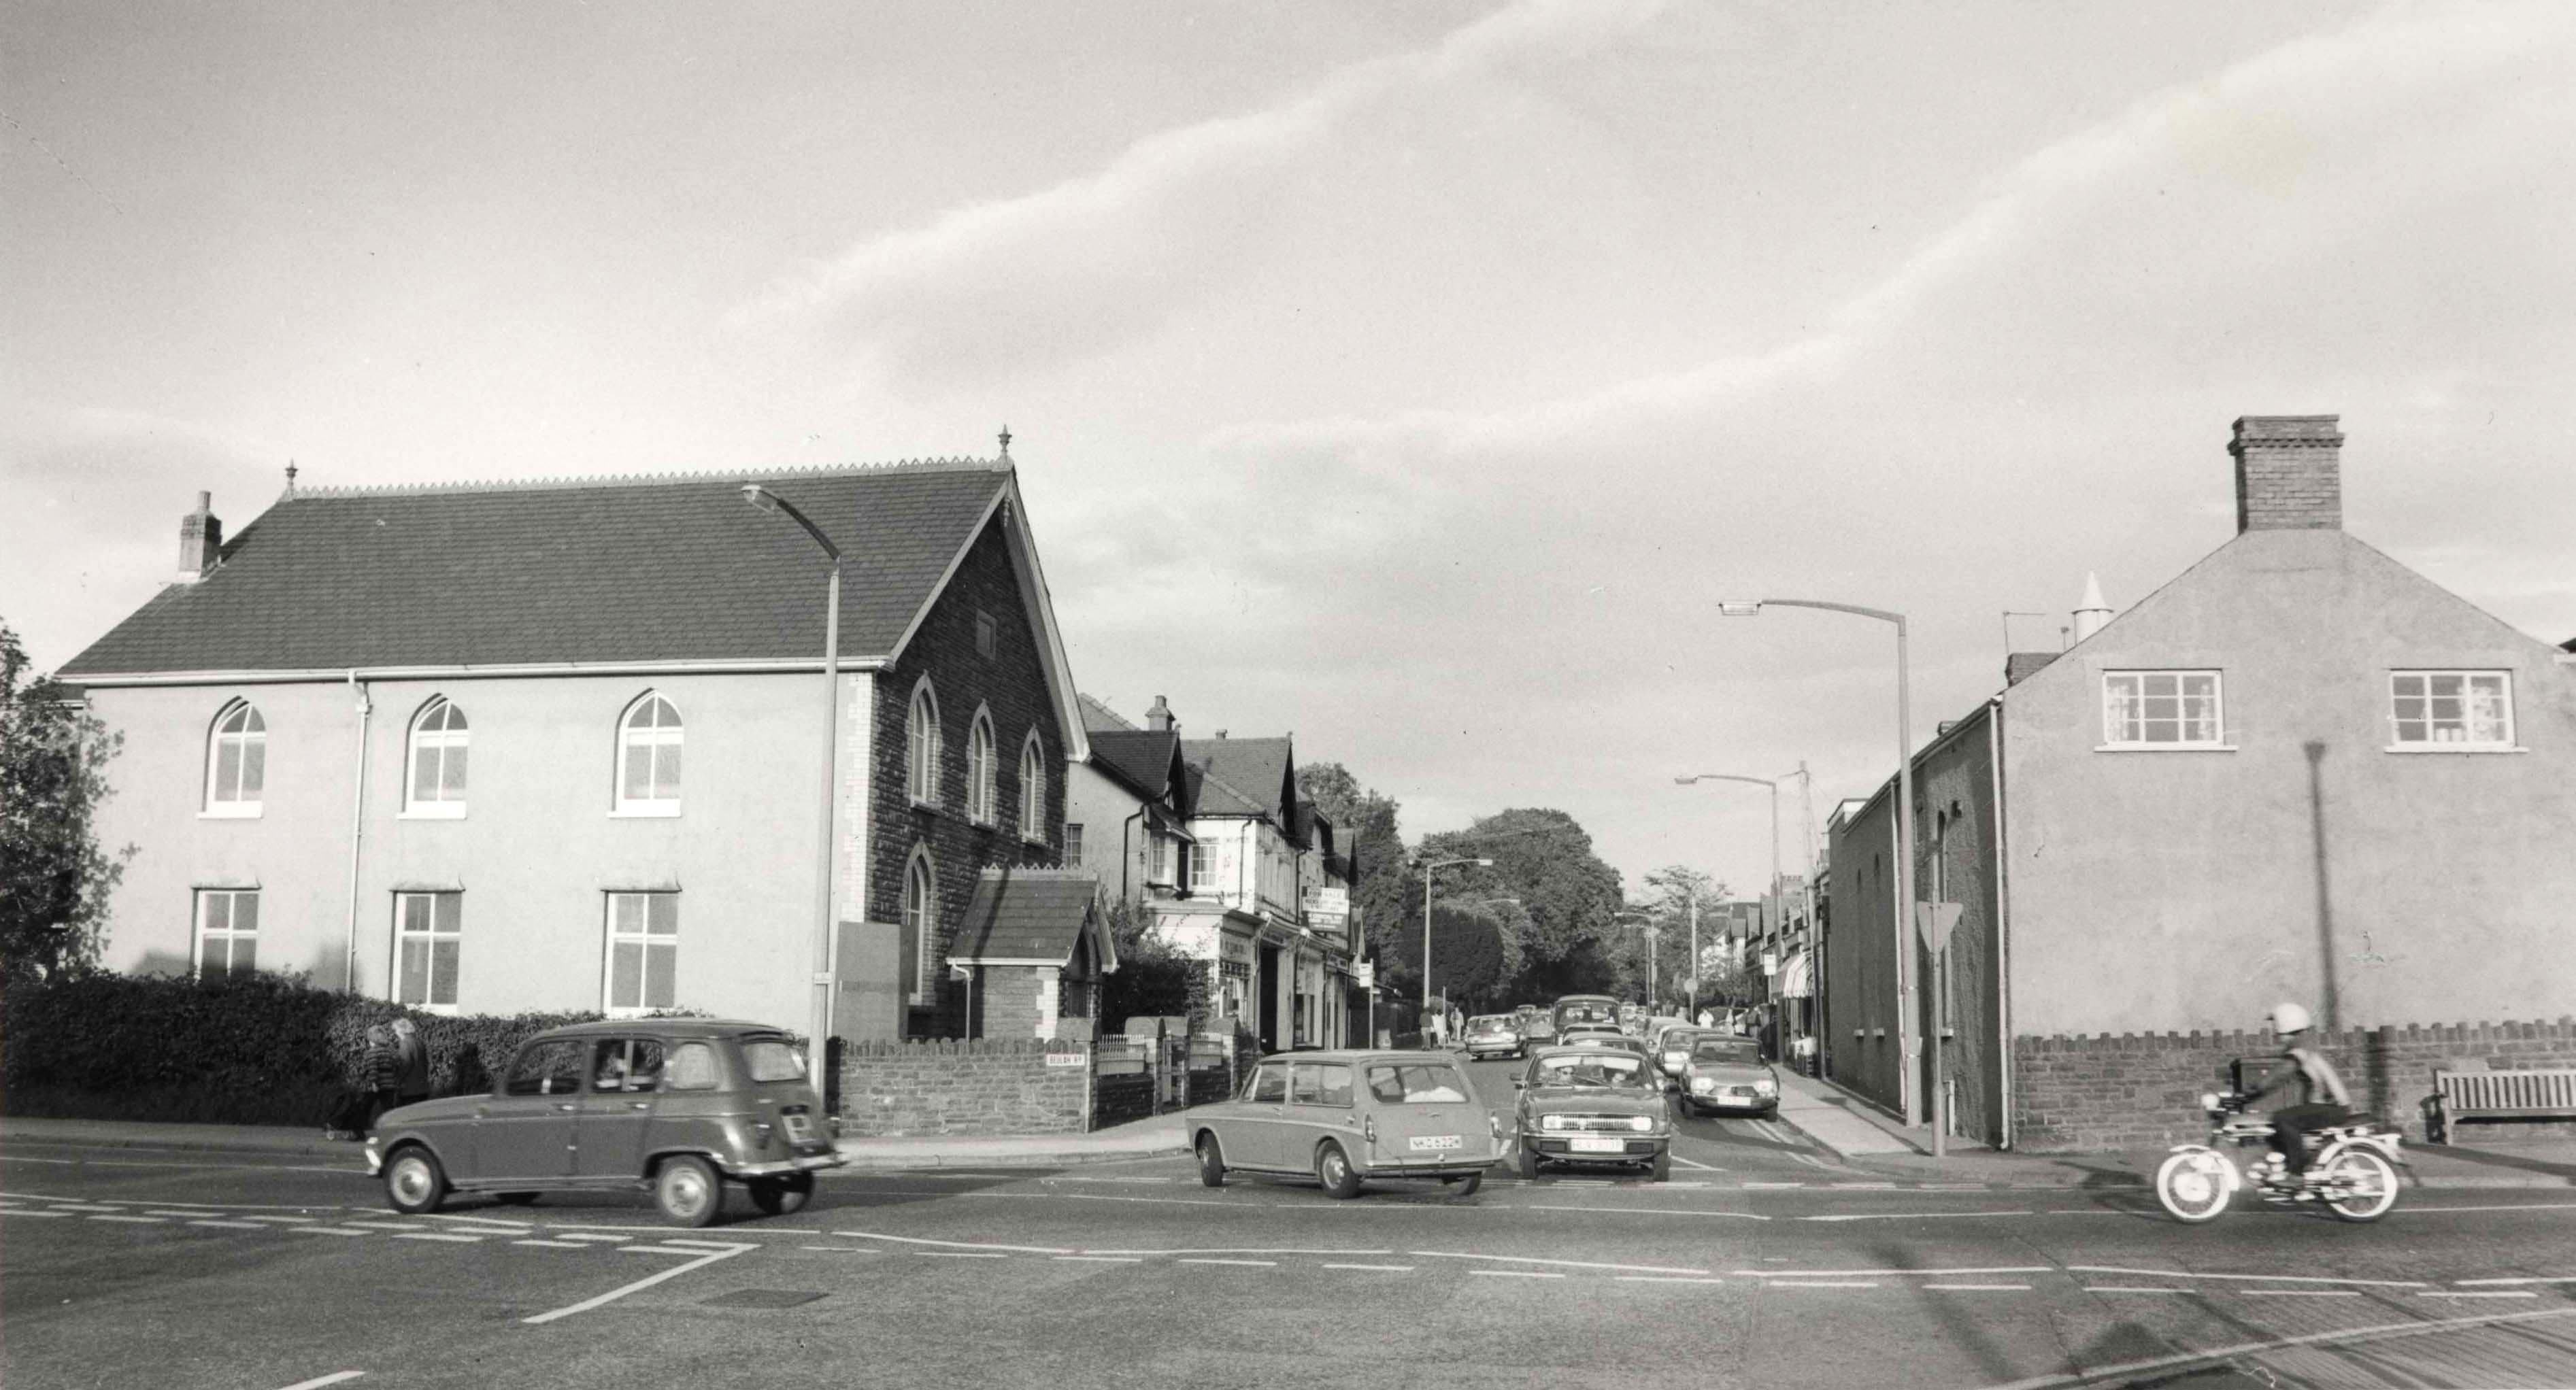 Looking into Beulah Rd from Hoel-y-Deri 1970's